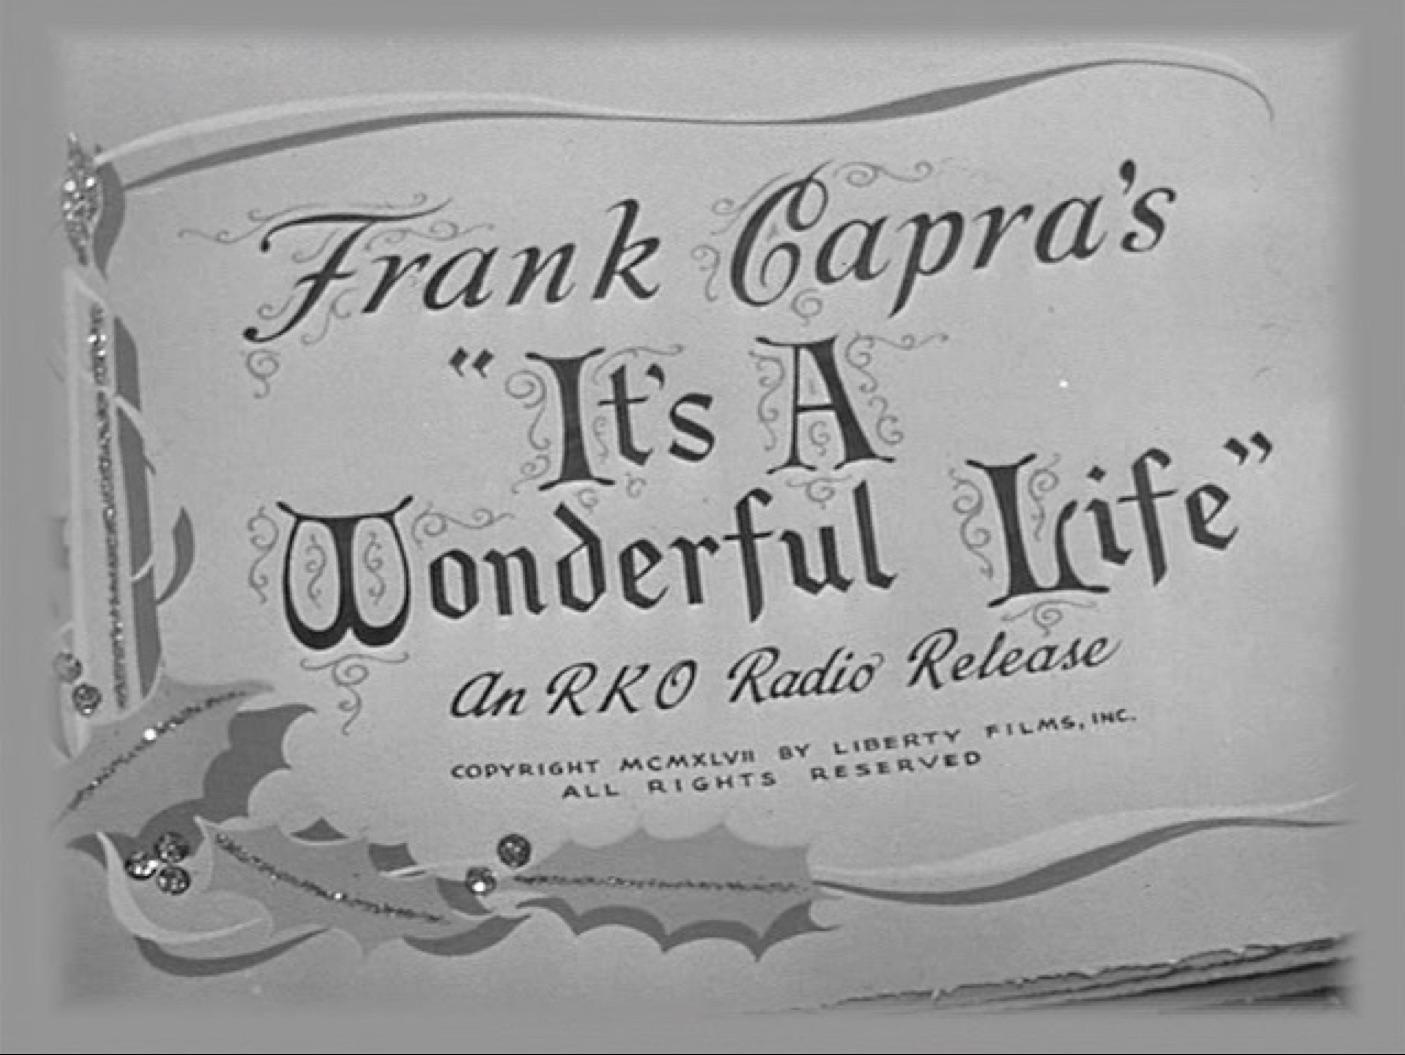 its-a-wonderful-life-logo.jpg